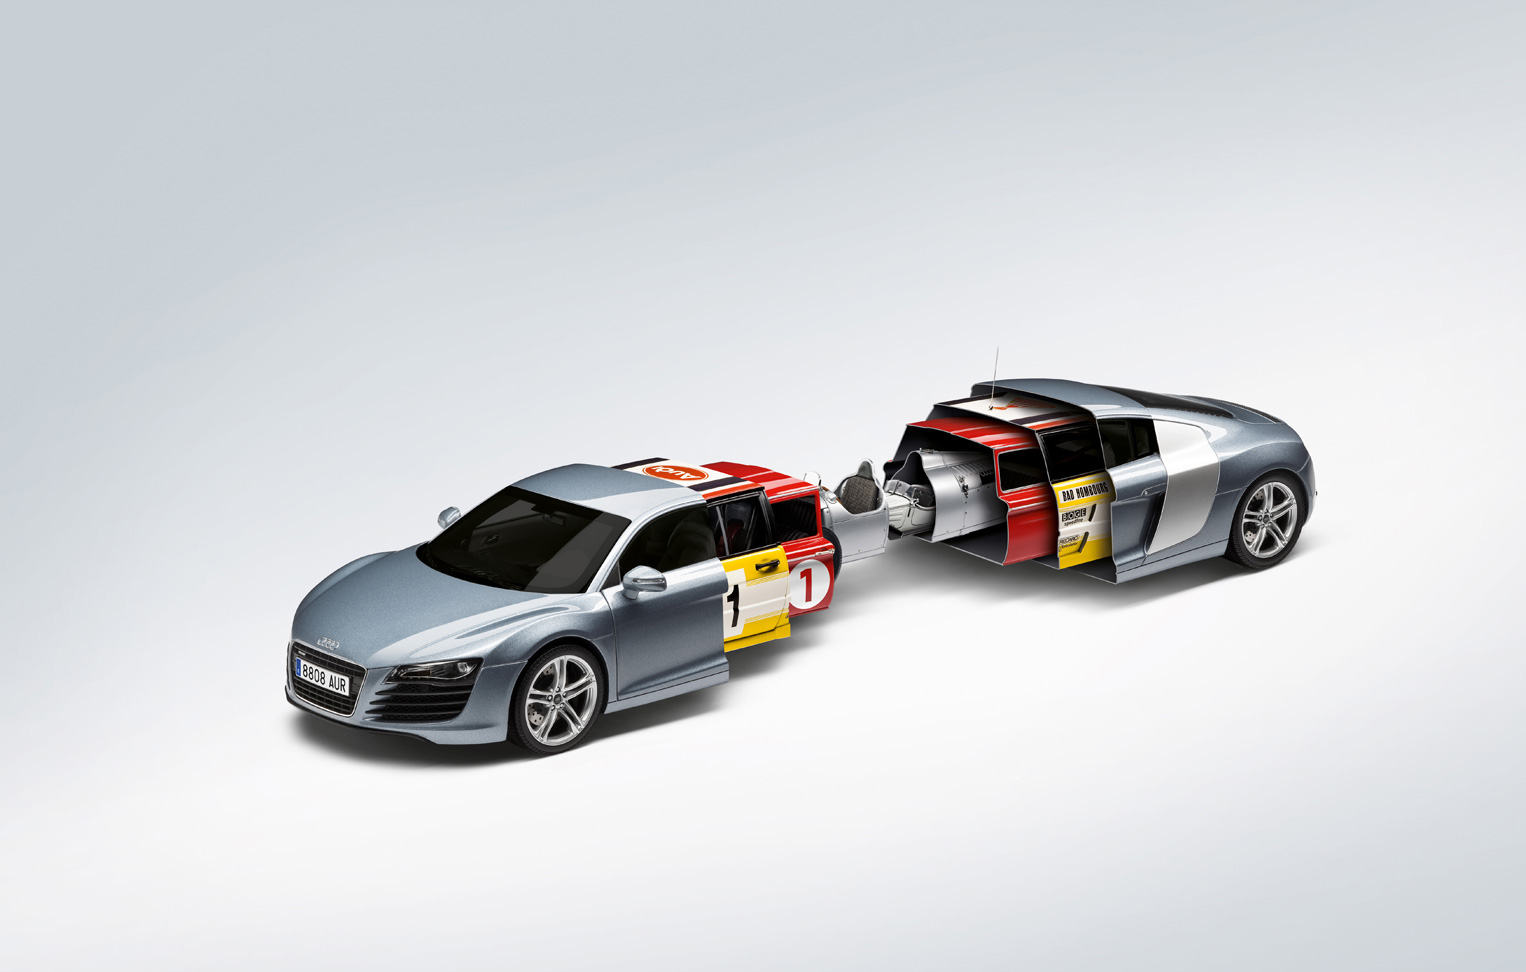 Audi R8 Turns Into Matryoshka Doll For New Print Ad